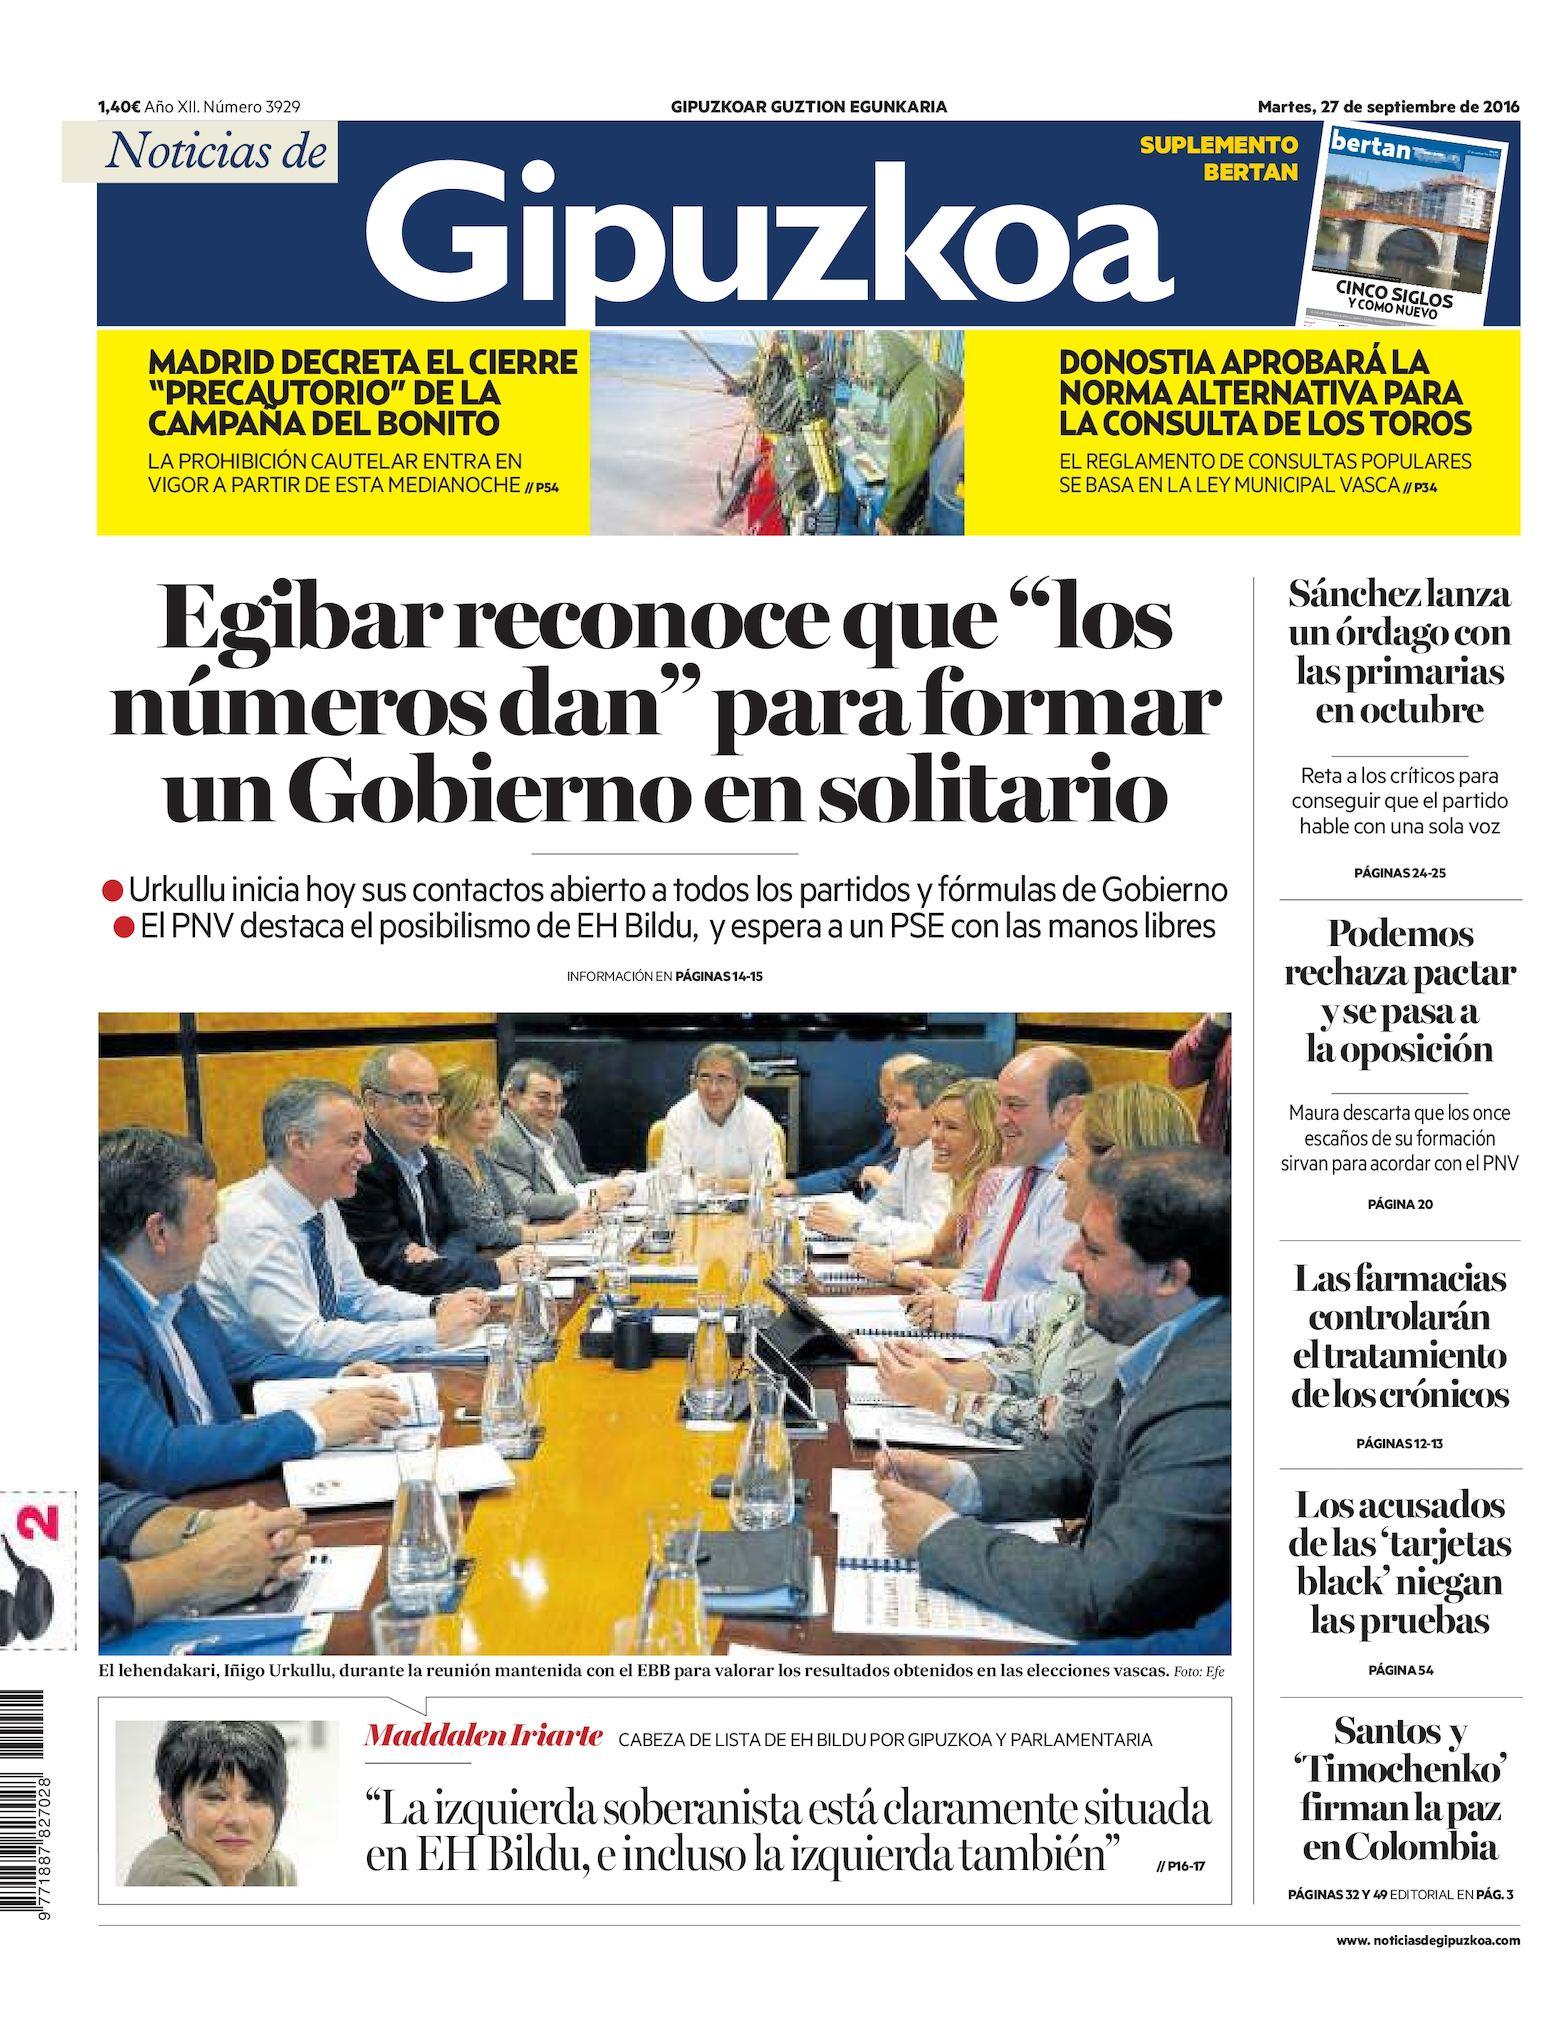 Calaméo - Noticias de Gipuzkoa 20160927 22e9f2e8f554d